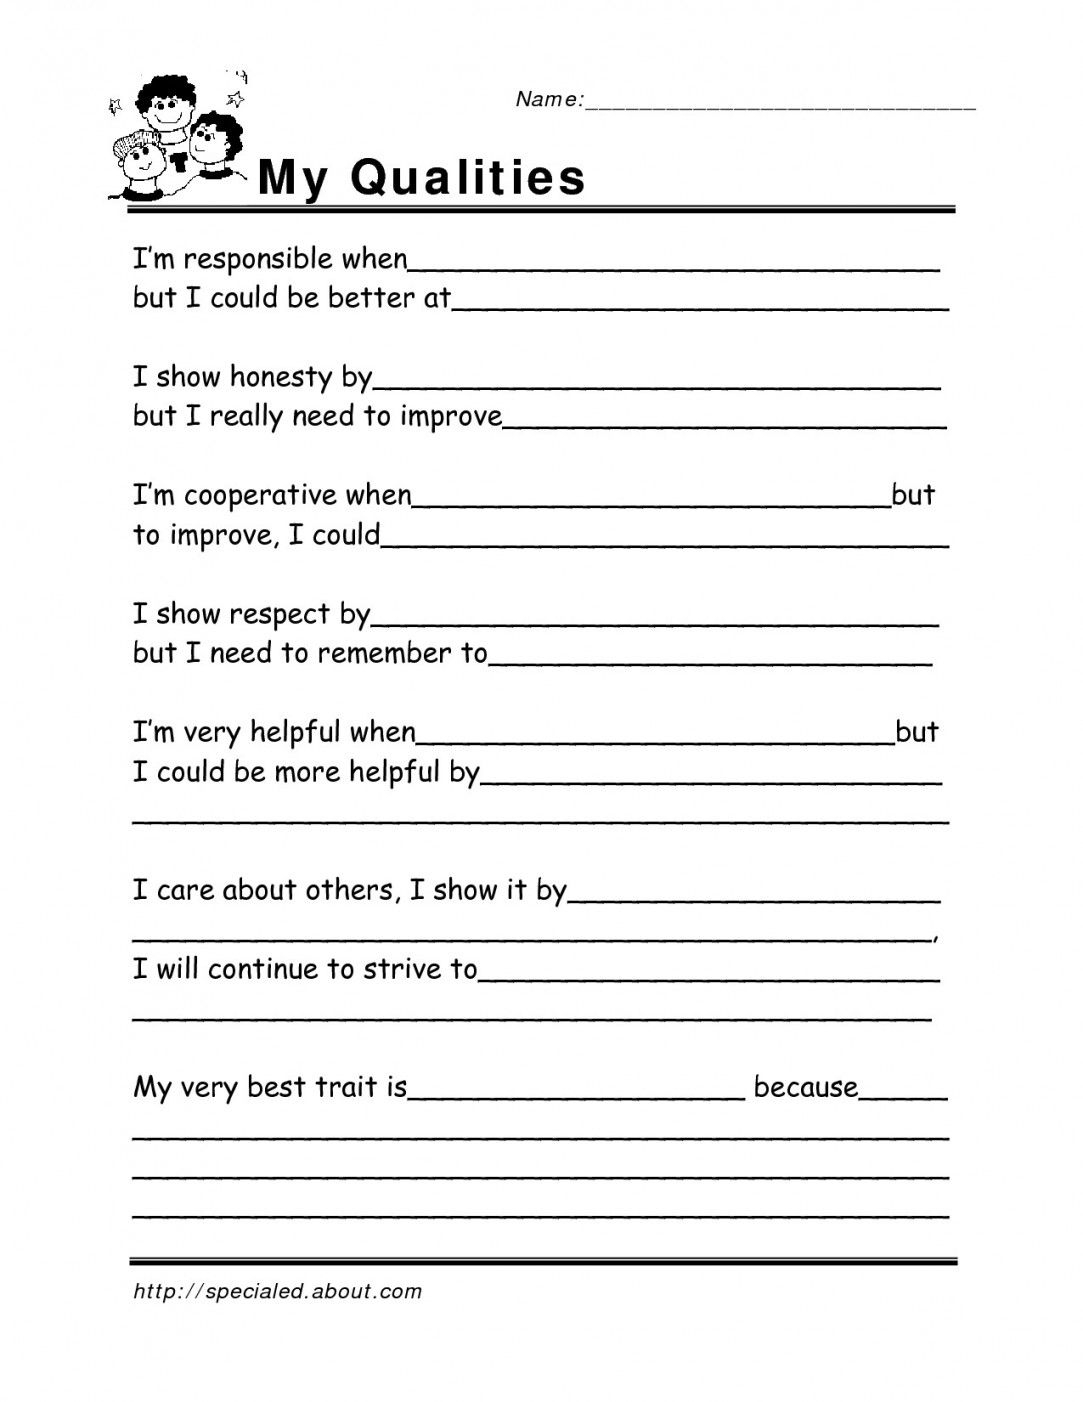 Free Printable Life Skills Worksheets   Lostranquillos - Free Printable Life Skills Worksheets